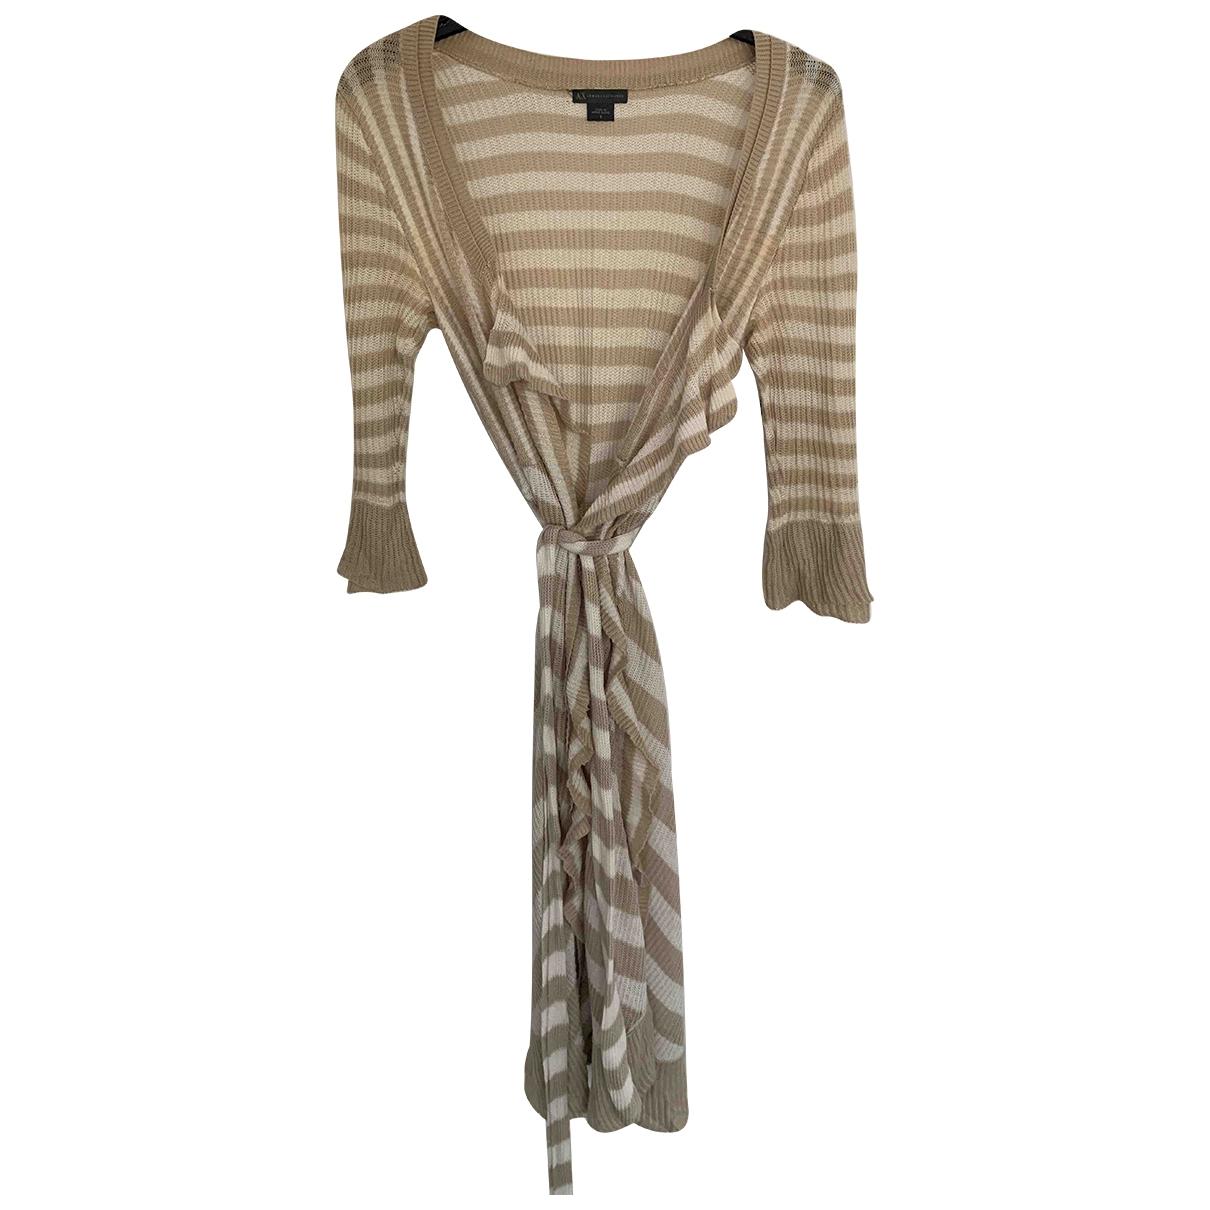 Emporio Armani \N Beige Cotton Knitwear for Women S International